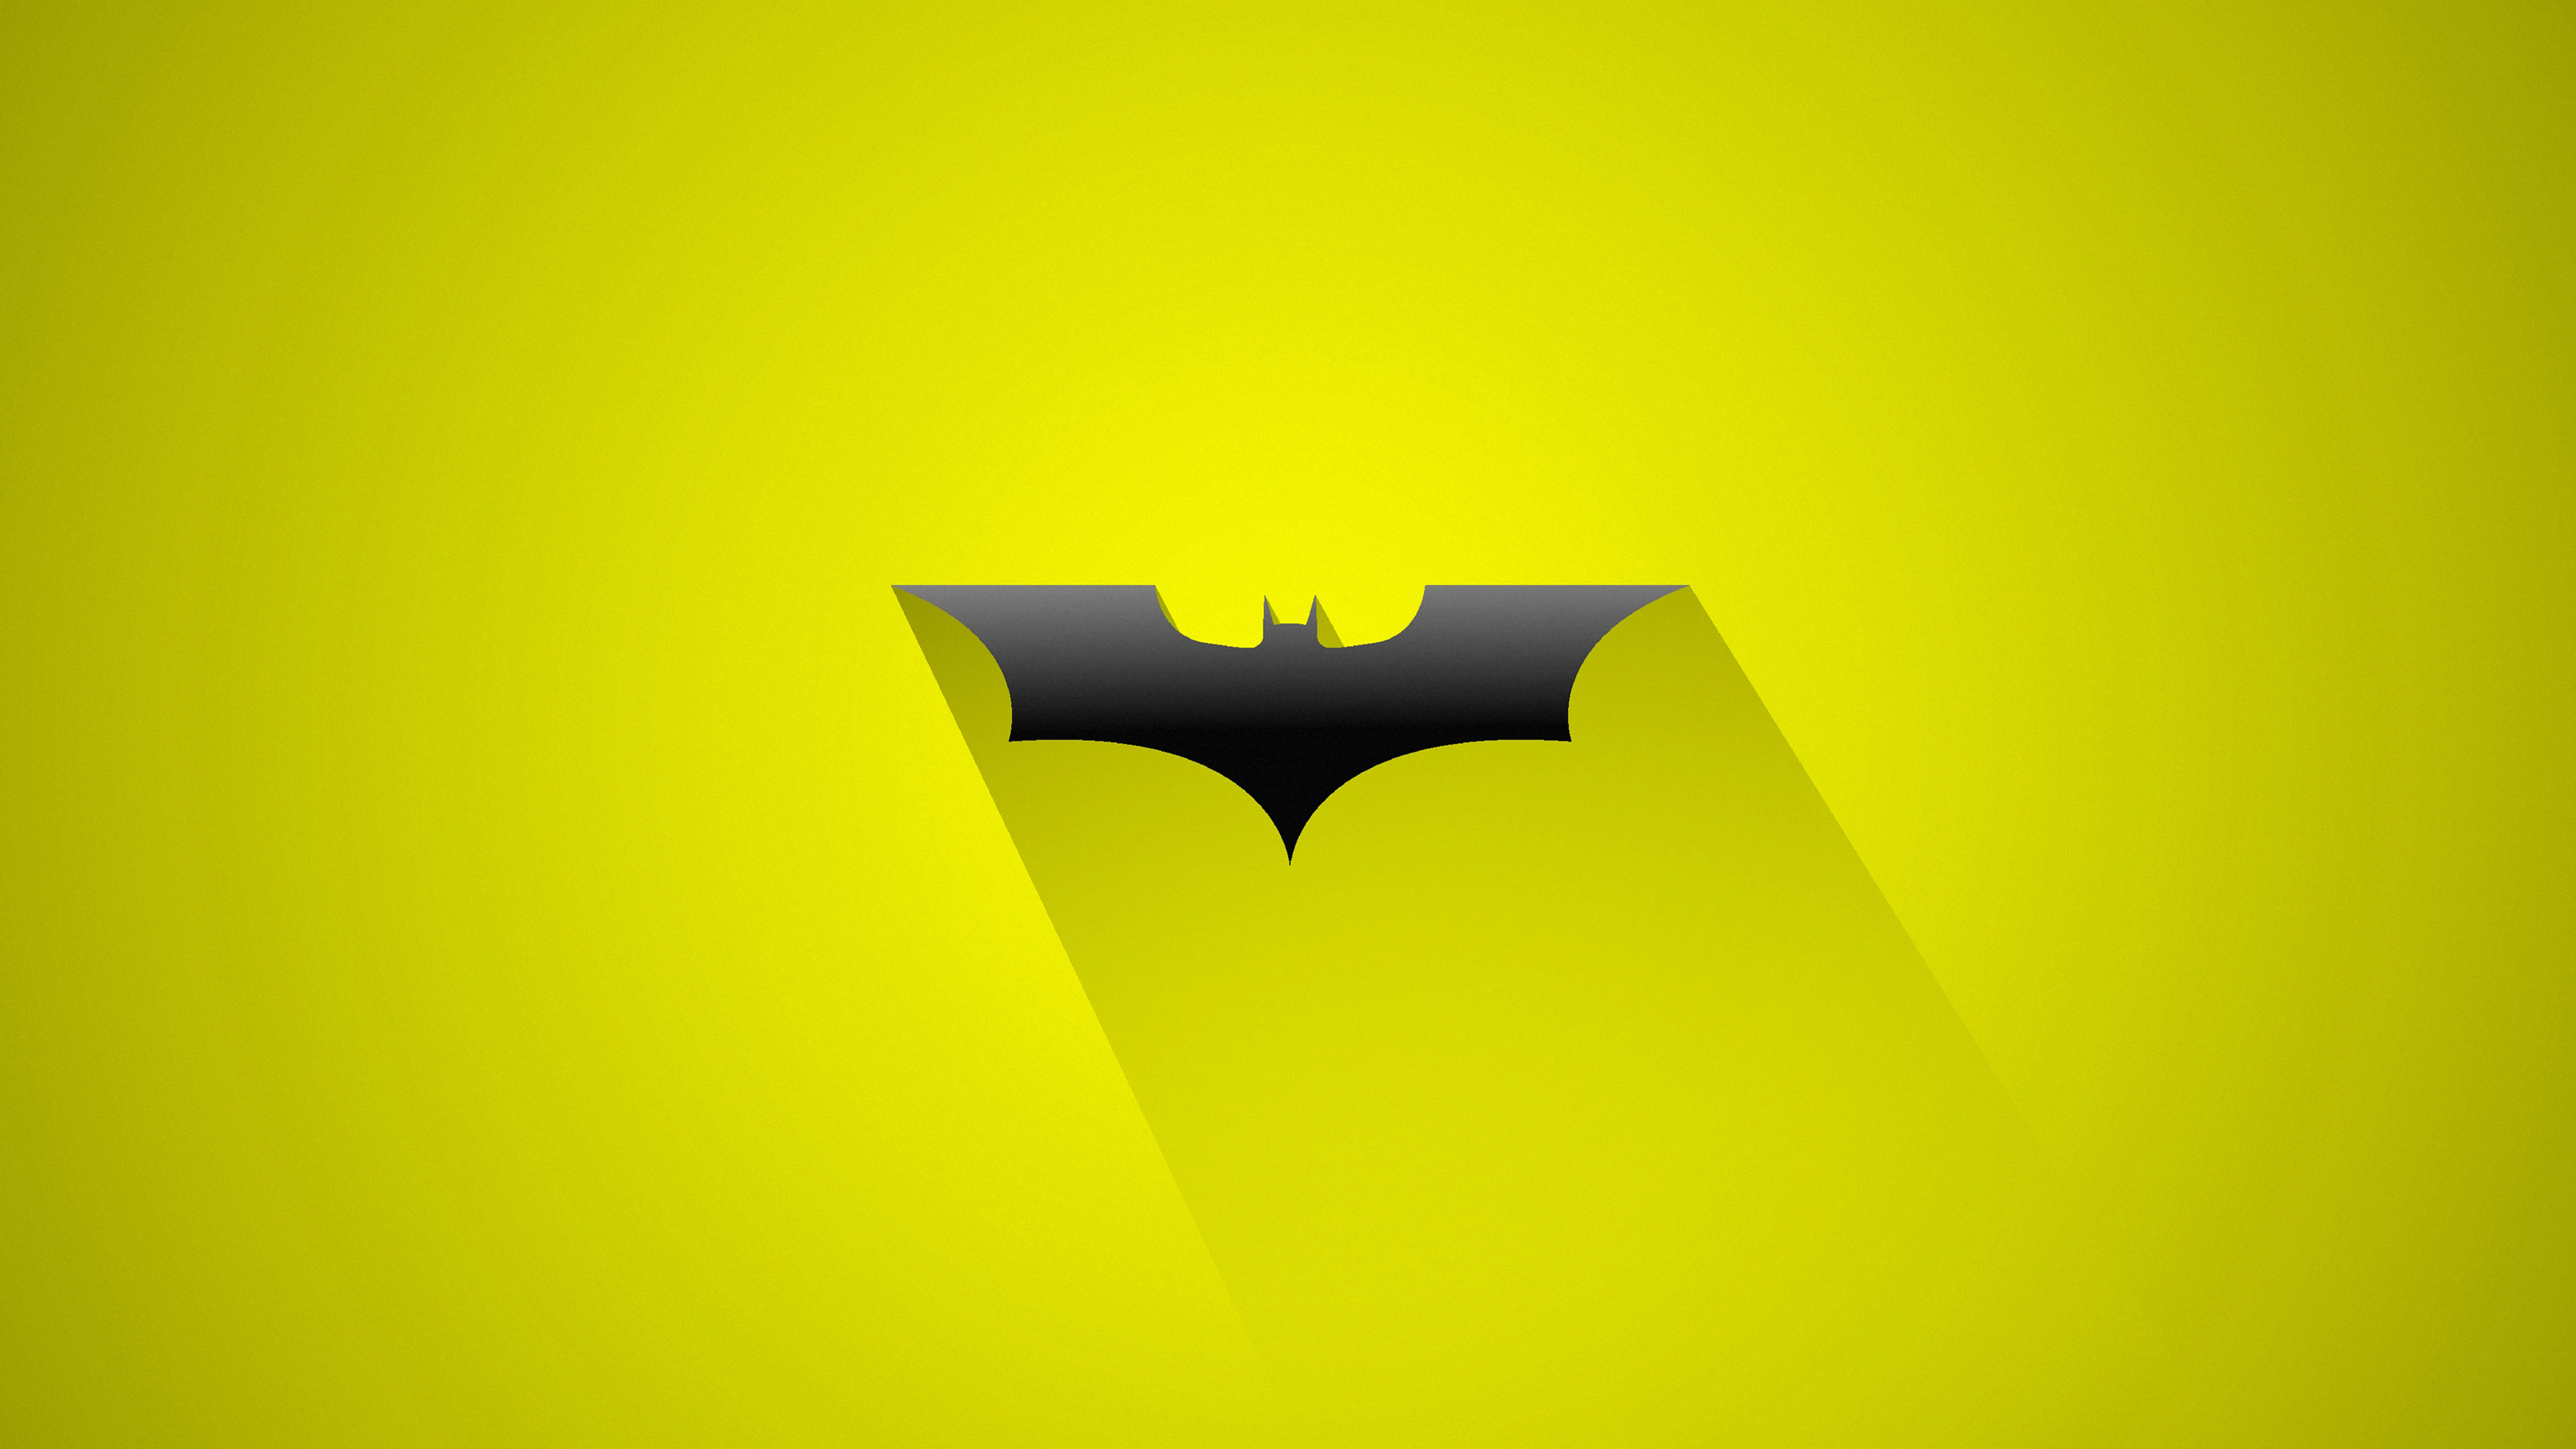 batman logo art 1570394514 - Batman Logo Art - superheroes wallpapers, logo wallpapers, hd-wallpapers, digital art wallpapers, batman wallpapers, artwork wallpapers, artist wallpapers, 4k-wallpapers